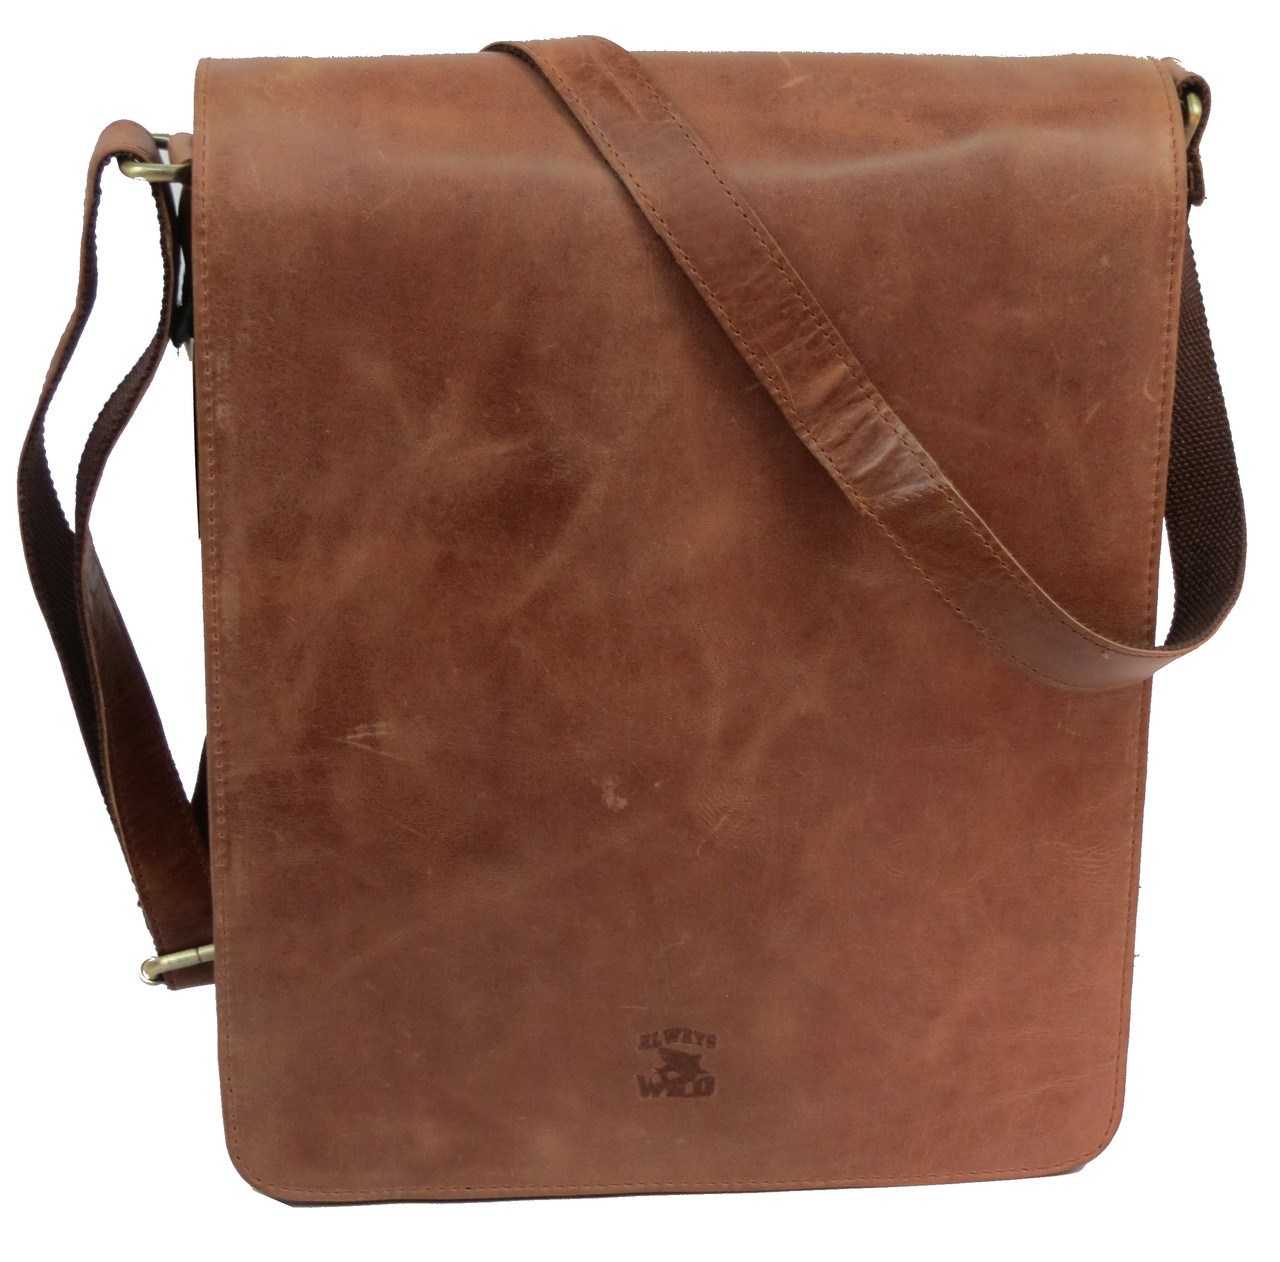 4dbf71d2c614 Мужская кожаная сумка планшетка Always Wild TIM-42 Cognac, 36х33х8 ...